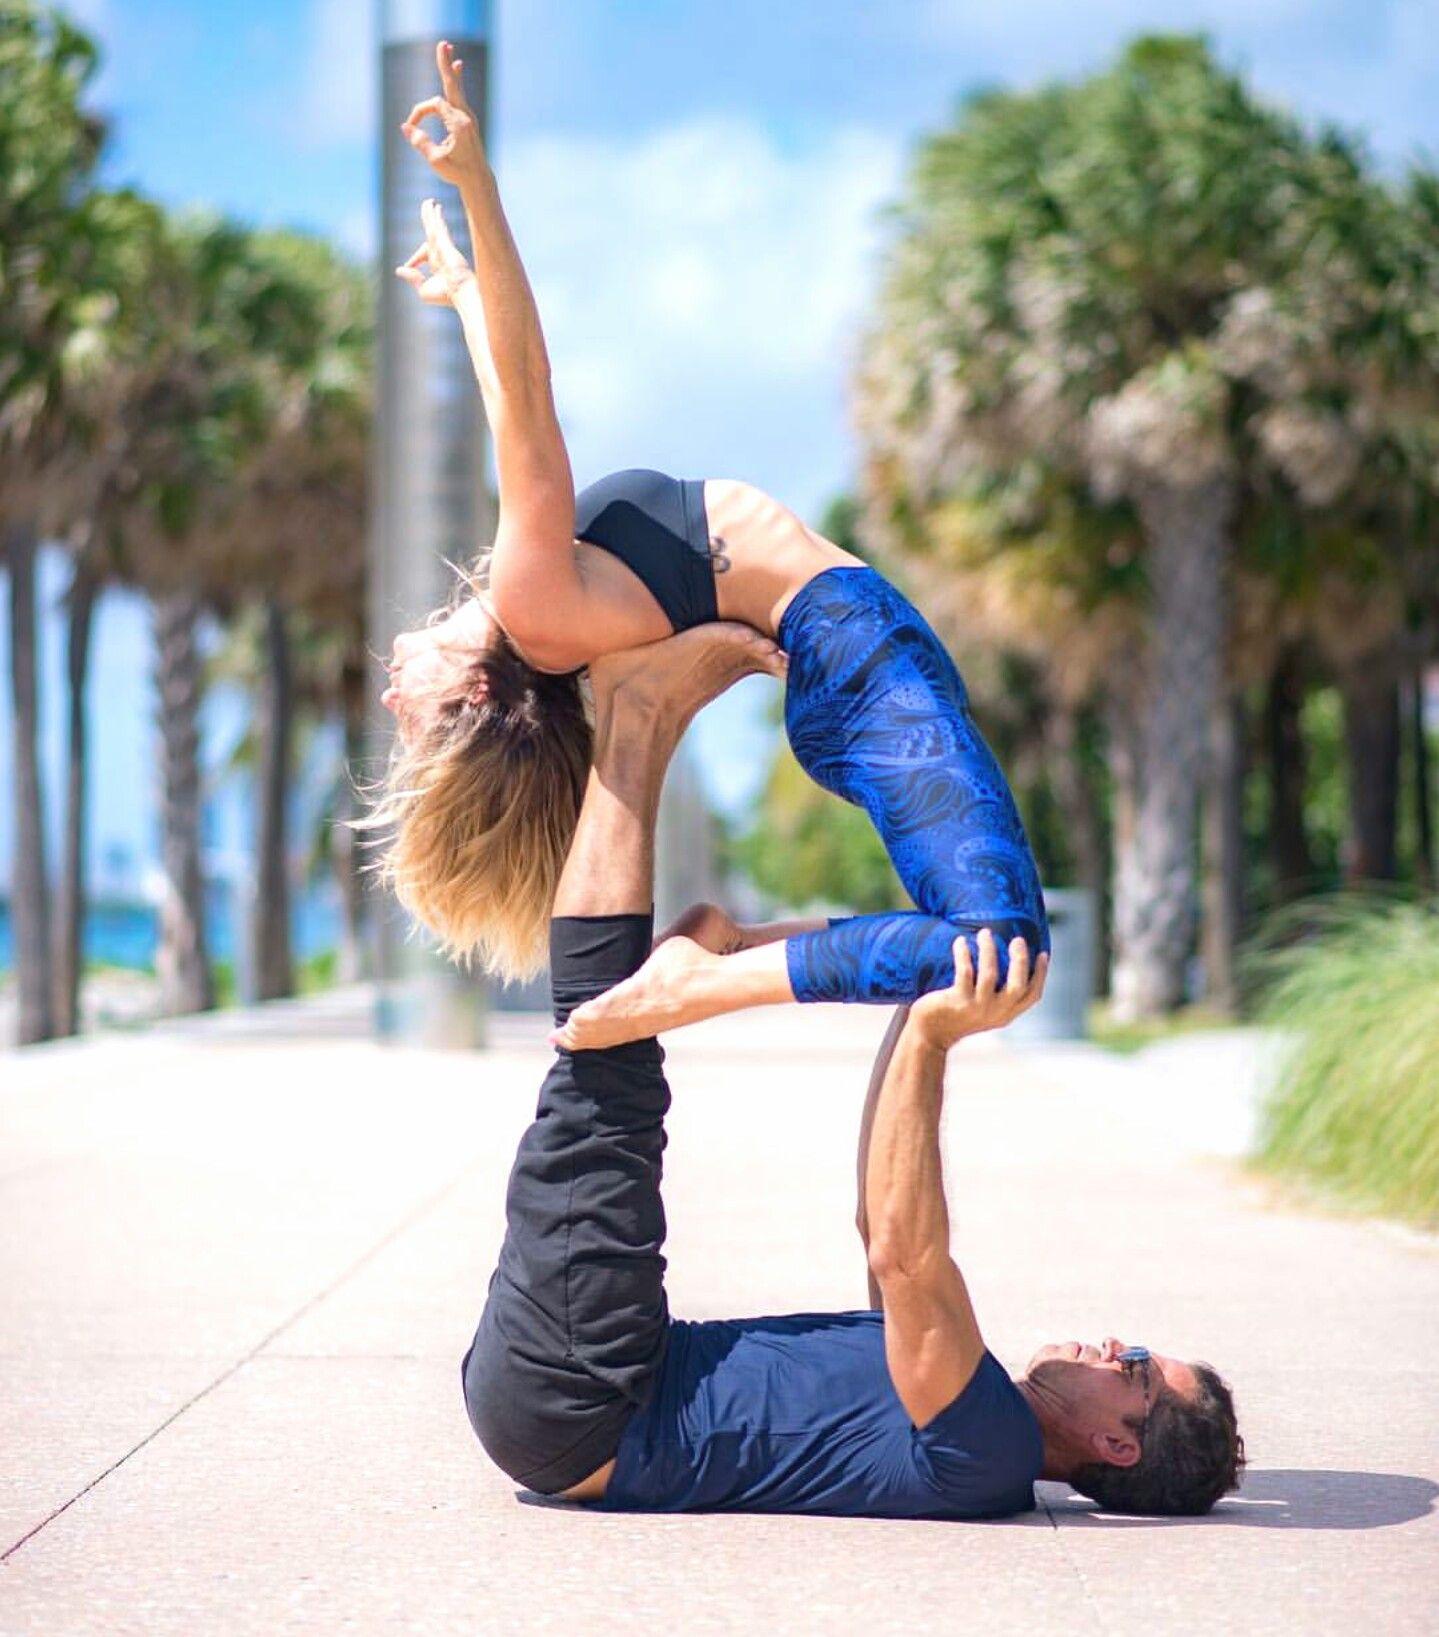 Acro Yoga Inspiration Bananablondie108 Murdoc305 Couples Yoga Poses Acro Yoga Poses Partner Yoga Poses